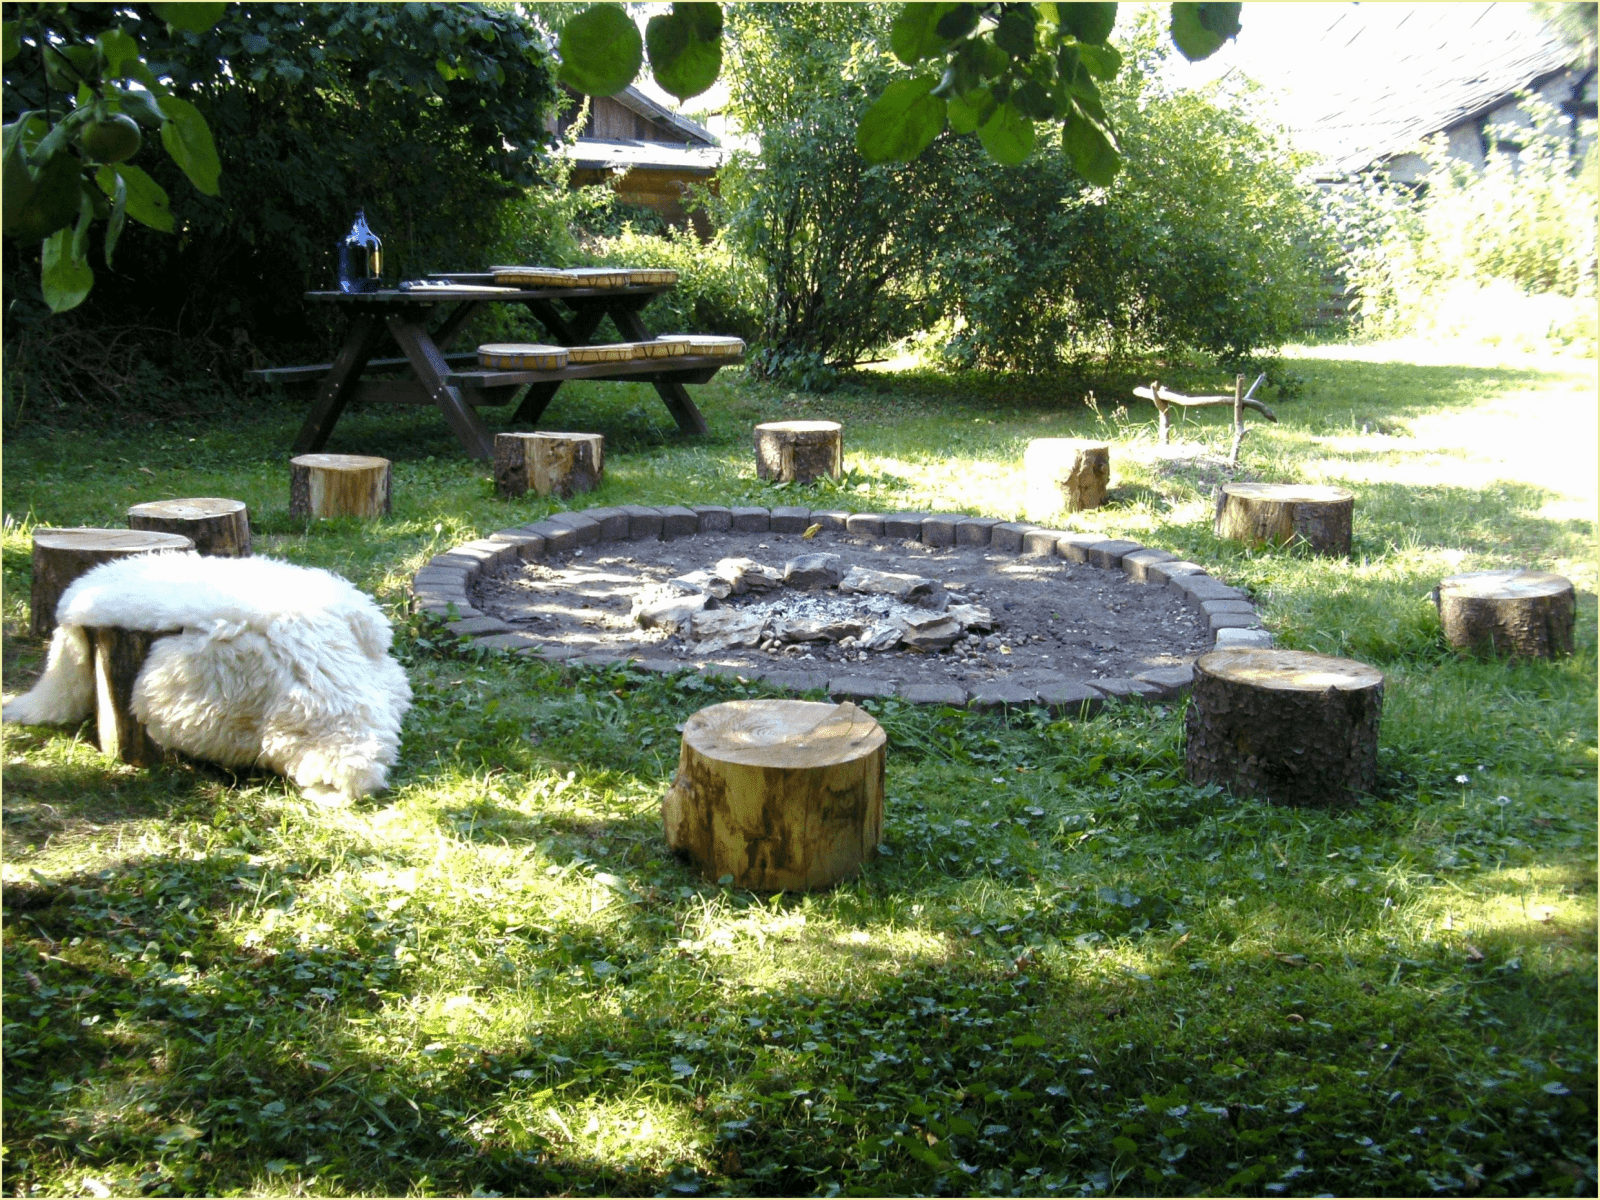 Garten Springbrunnen Selber Bauen 45 Luxus Brunnen Garten Grafik von Brunnen Garten Selber Bauen Photo